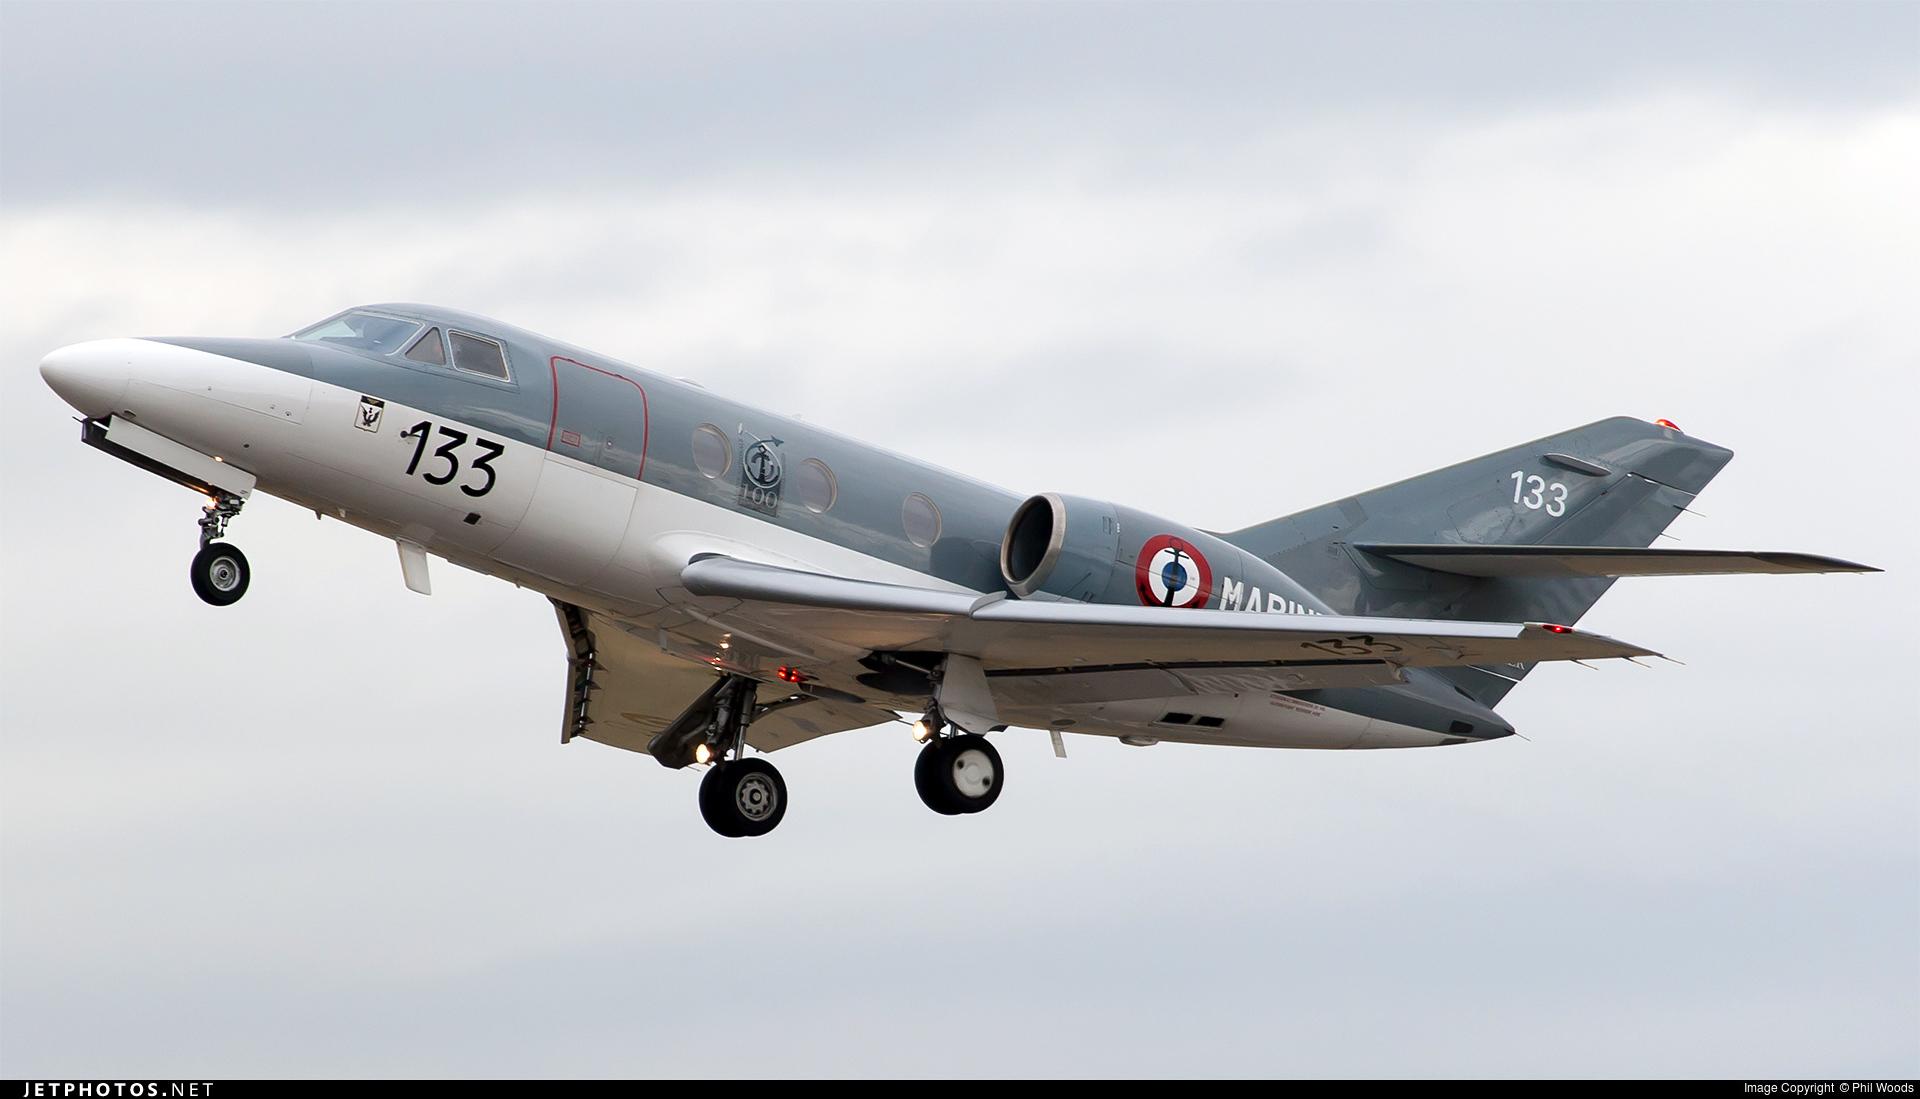 133 dassault falcon 10mer france navy jetphotos. Black Bedroom Furniture Sets. Home Design Ideas